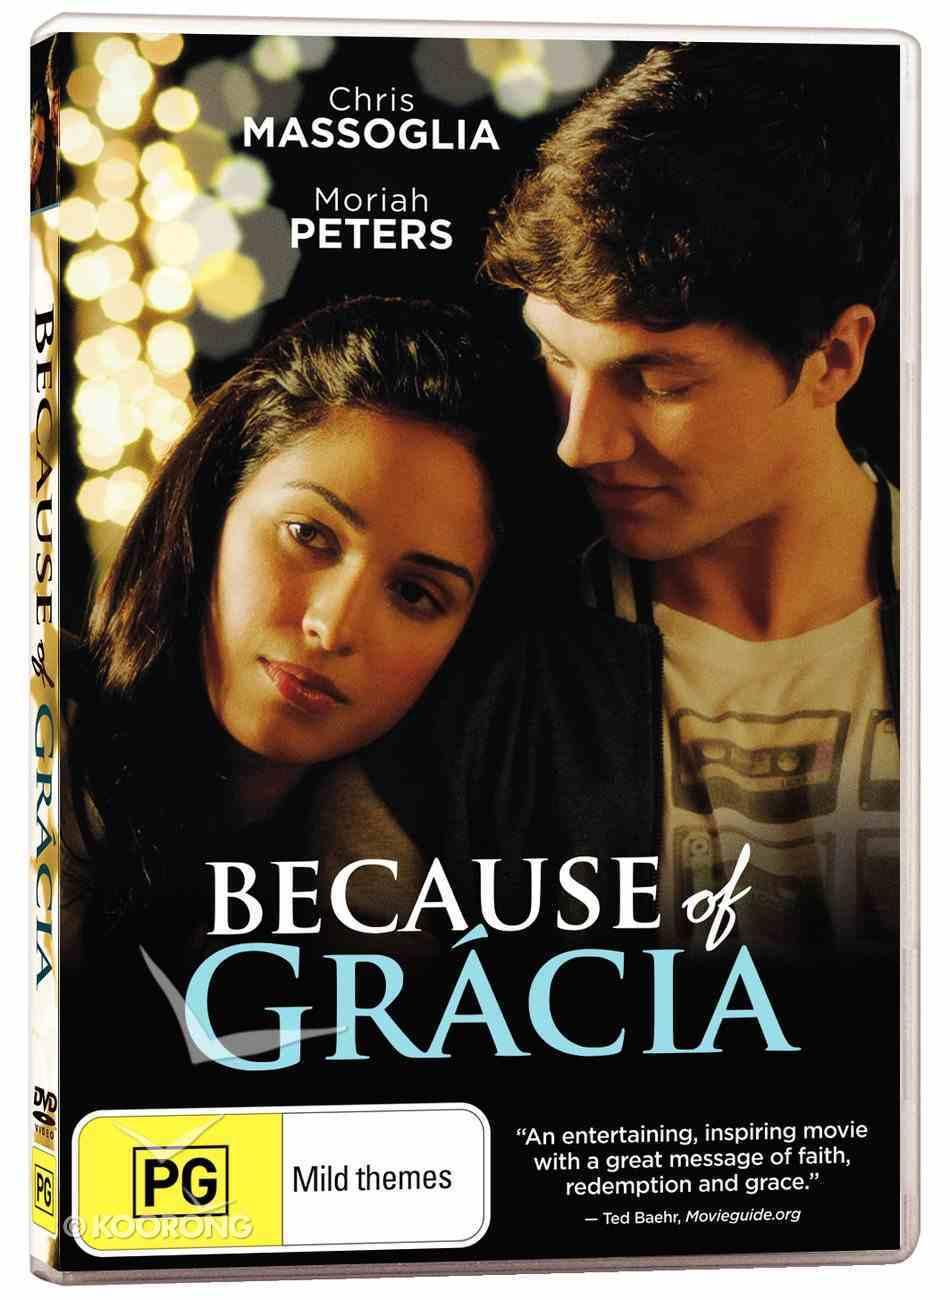 Because of Gracia DVD